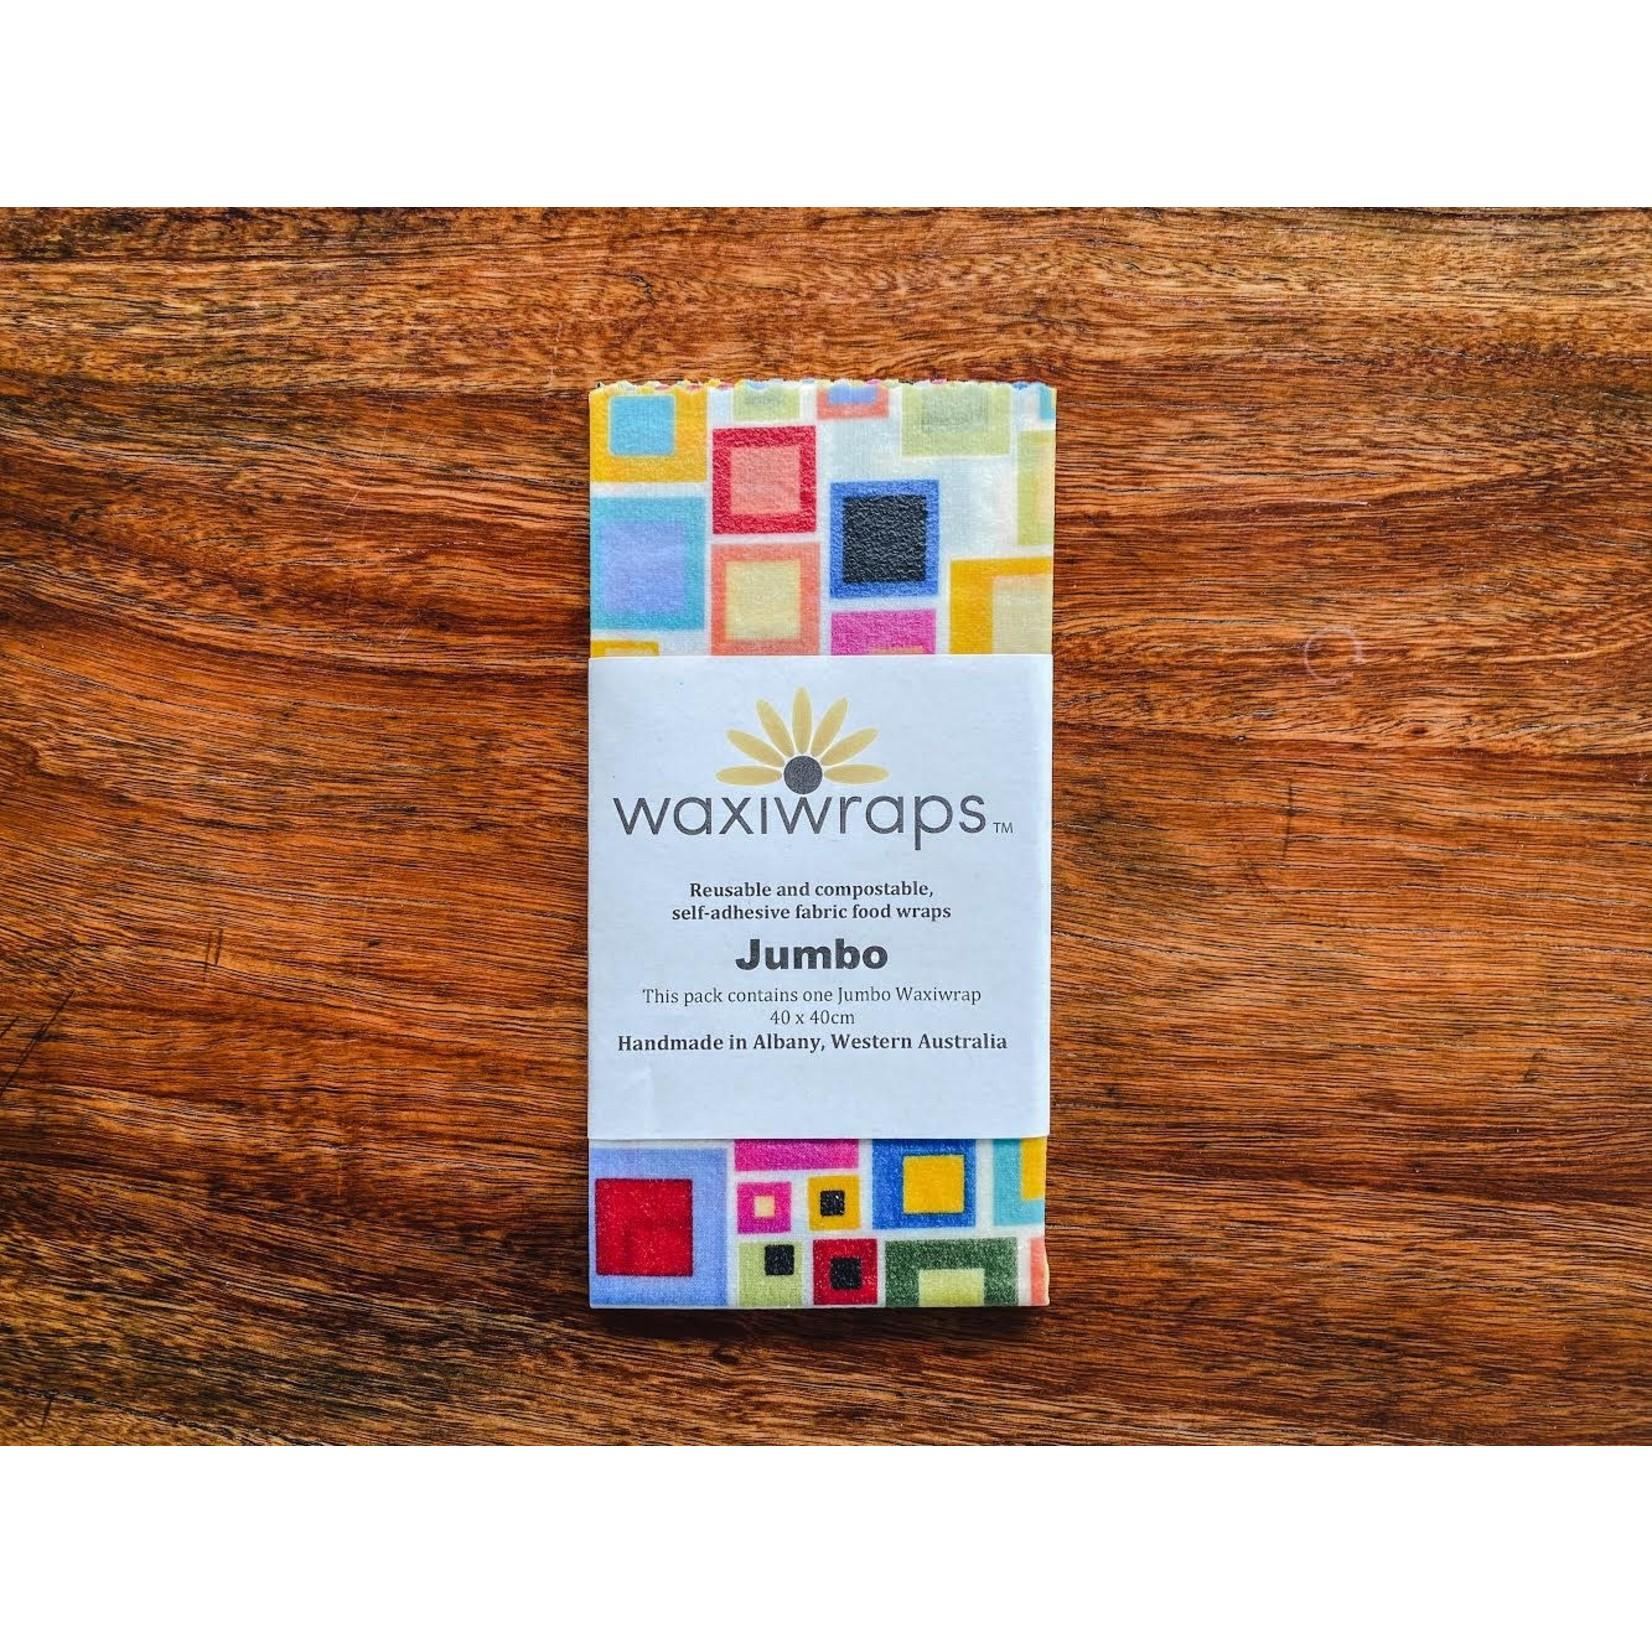 WaxiWraps Waxiwraps Jumbo 40 x 40cm Square